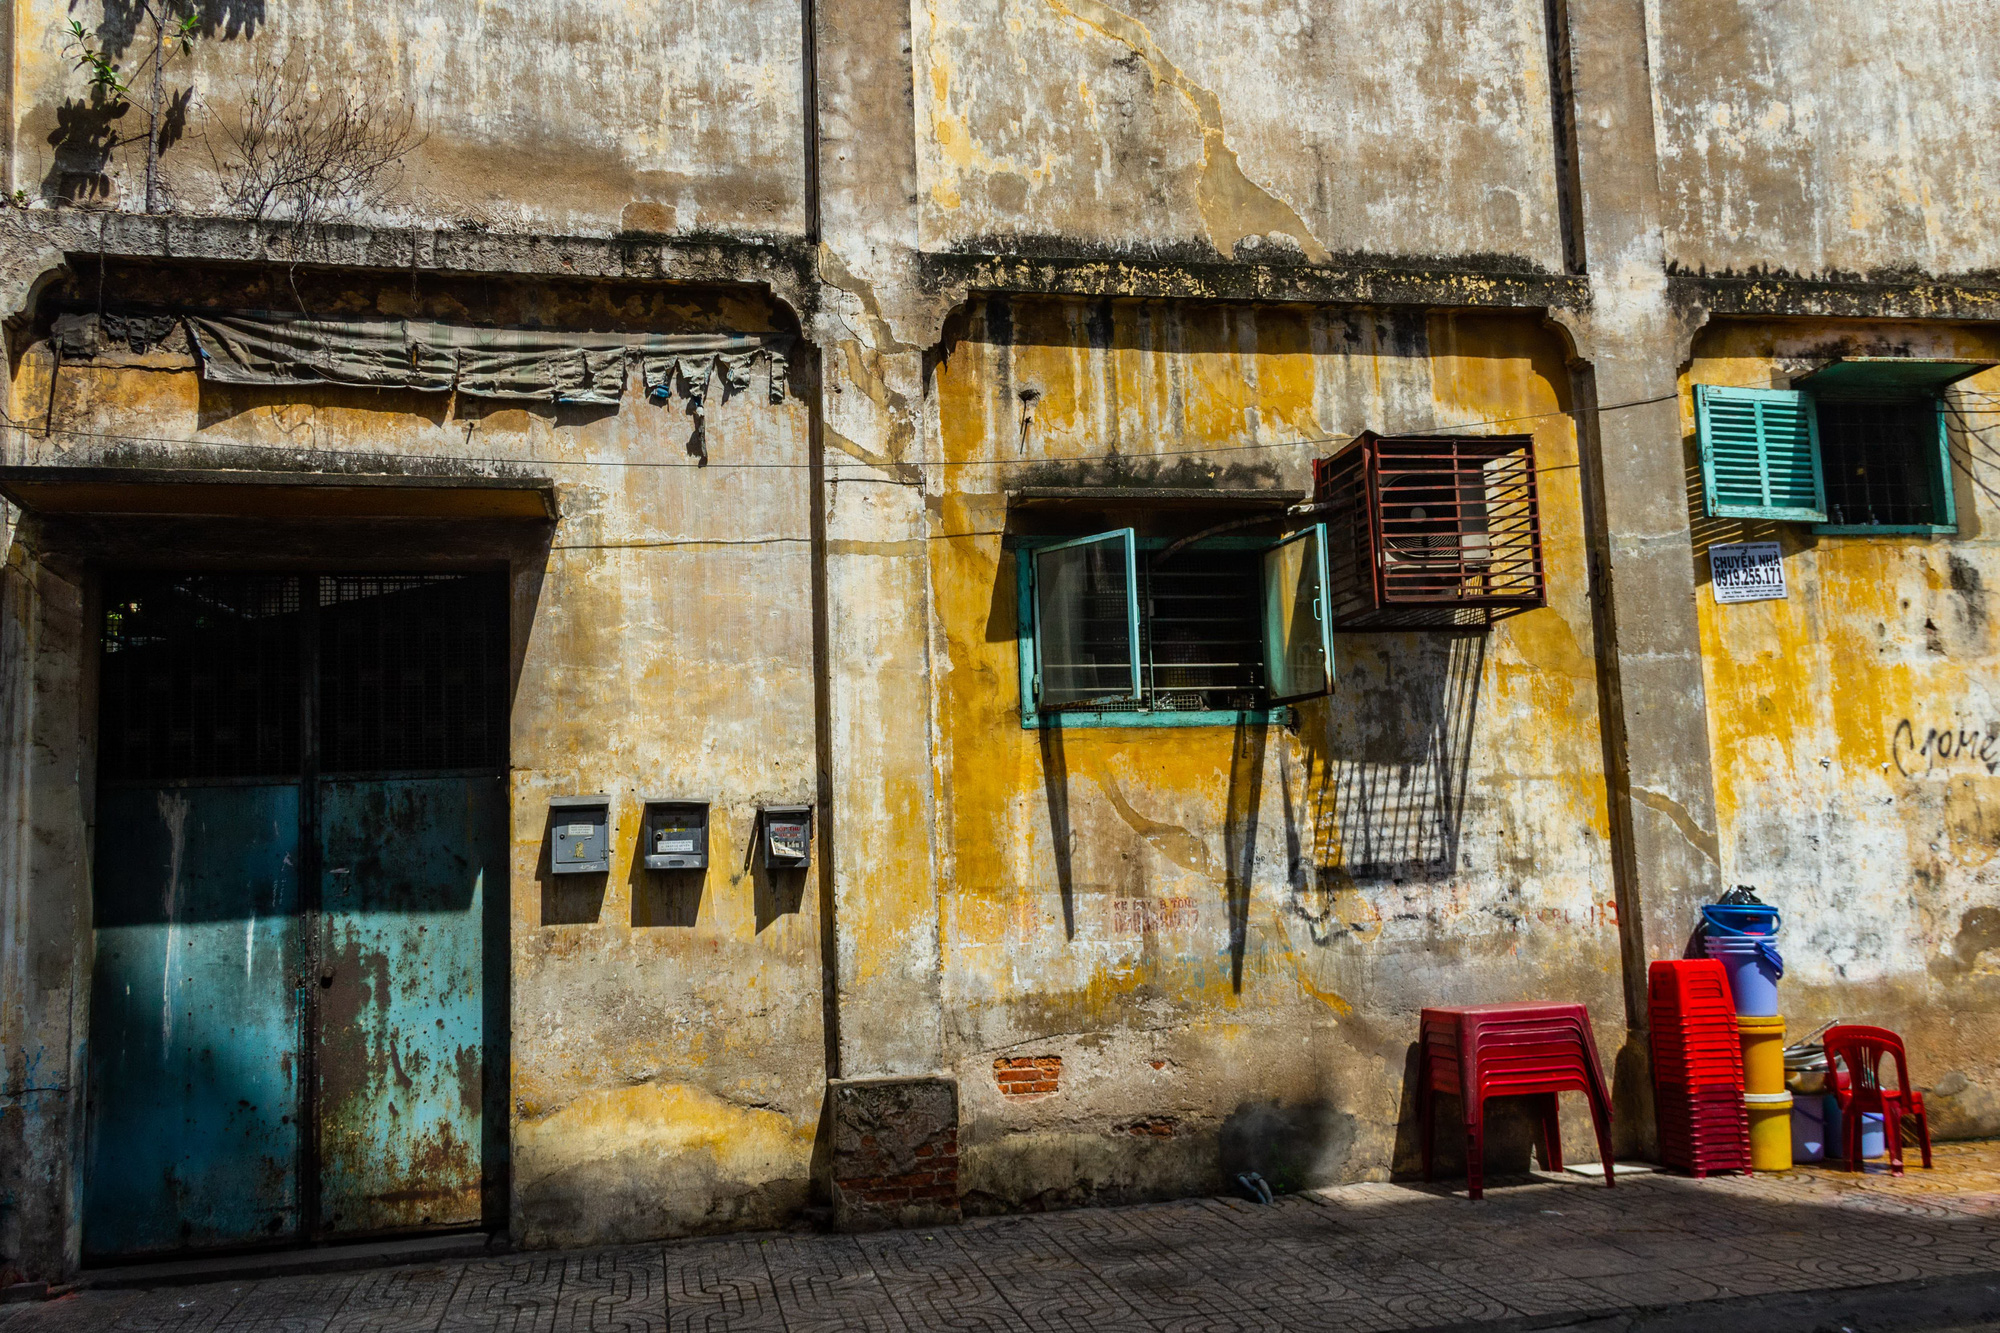 Exploring Saigon like a Saigonese